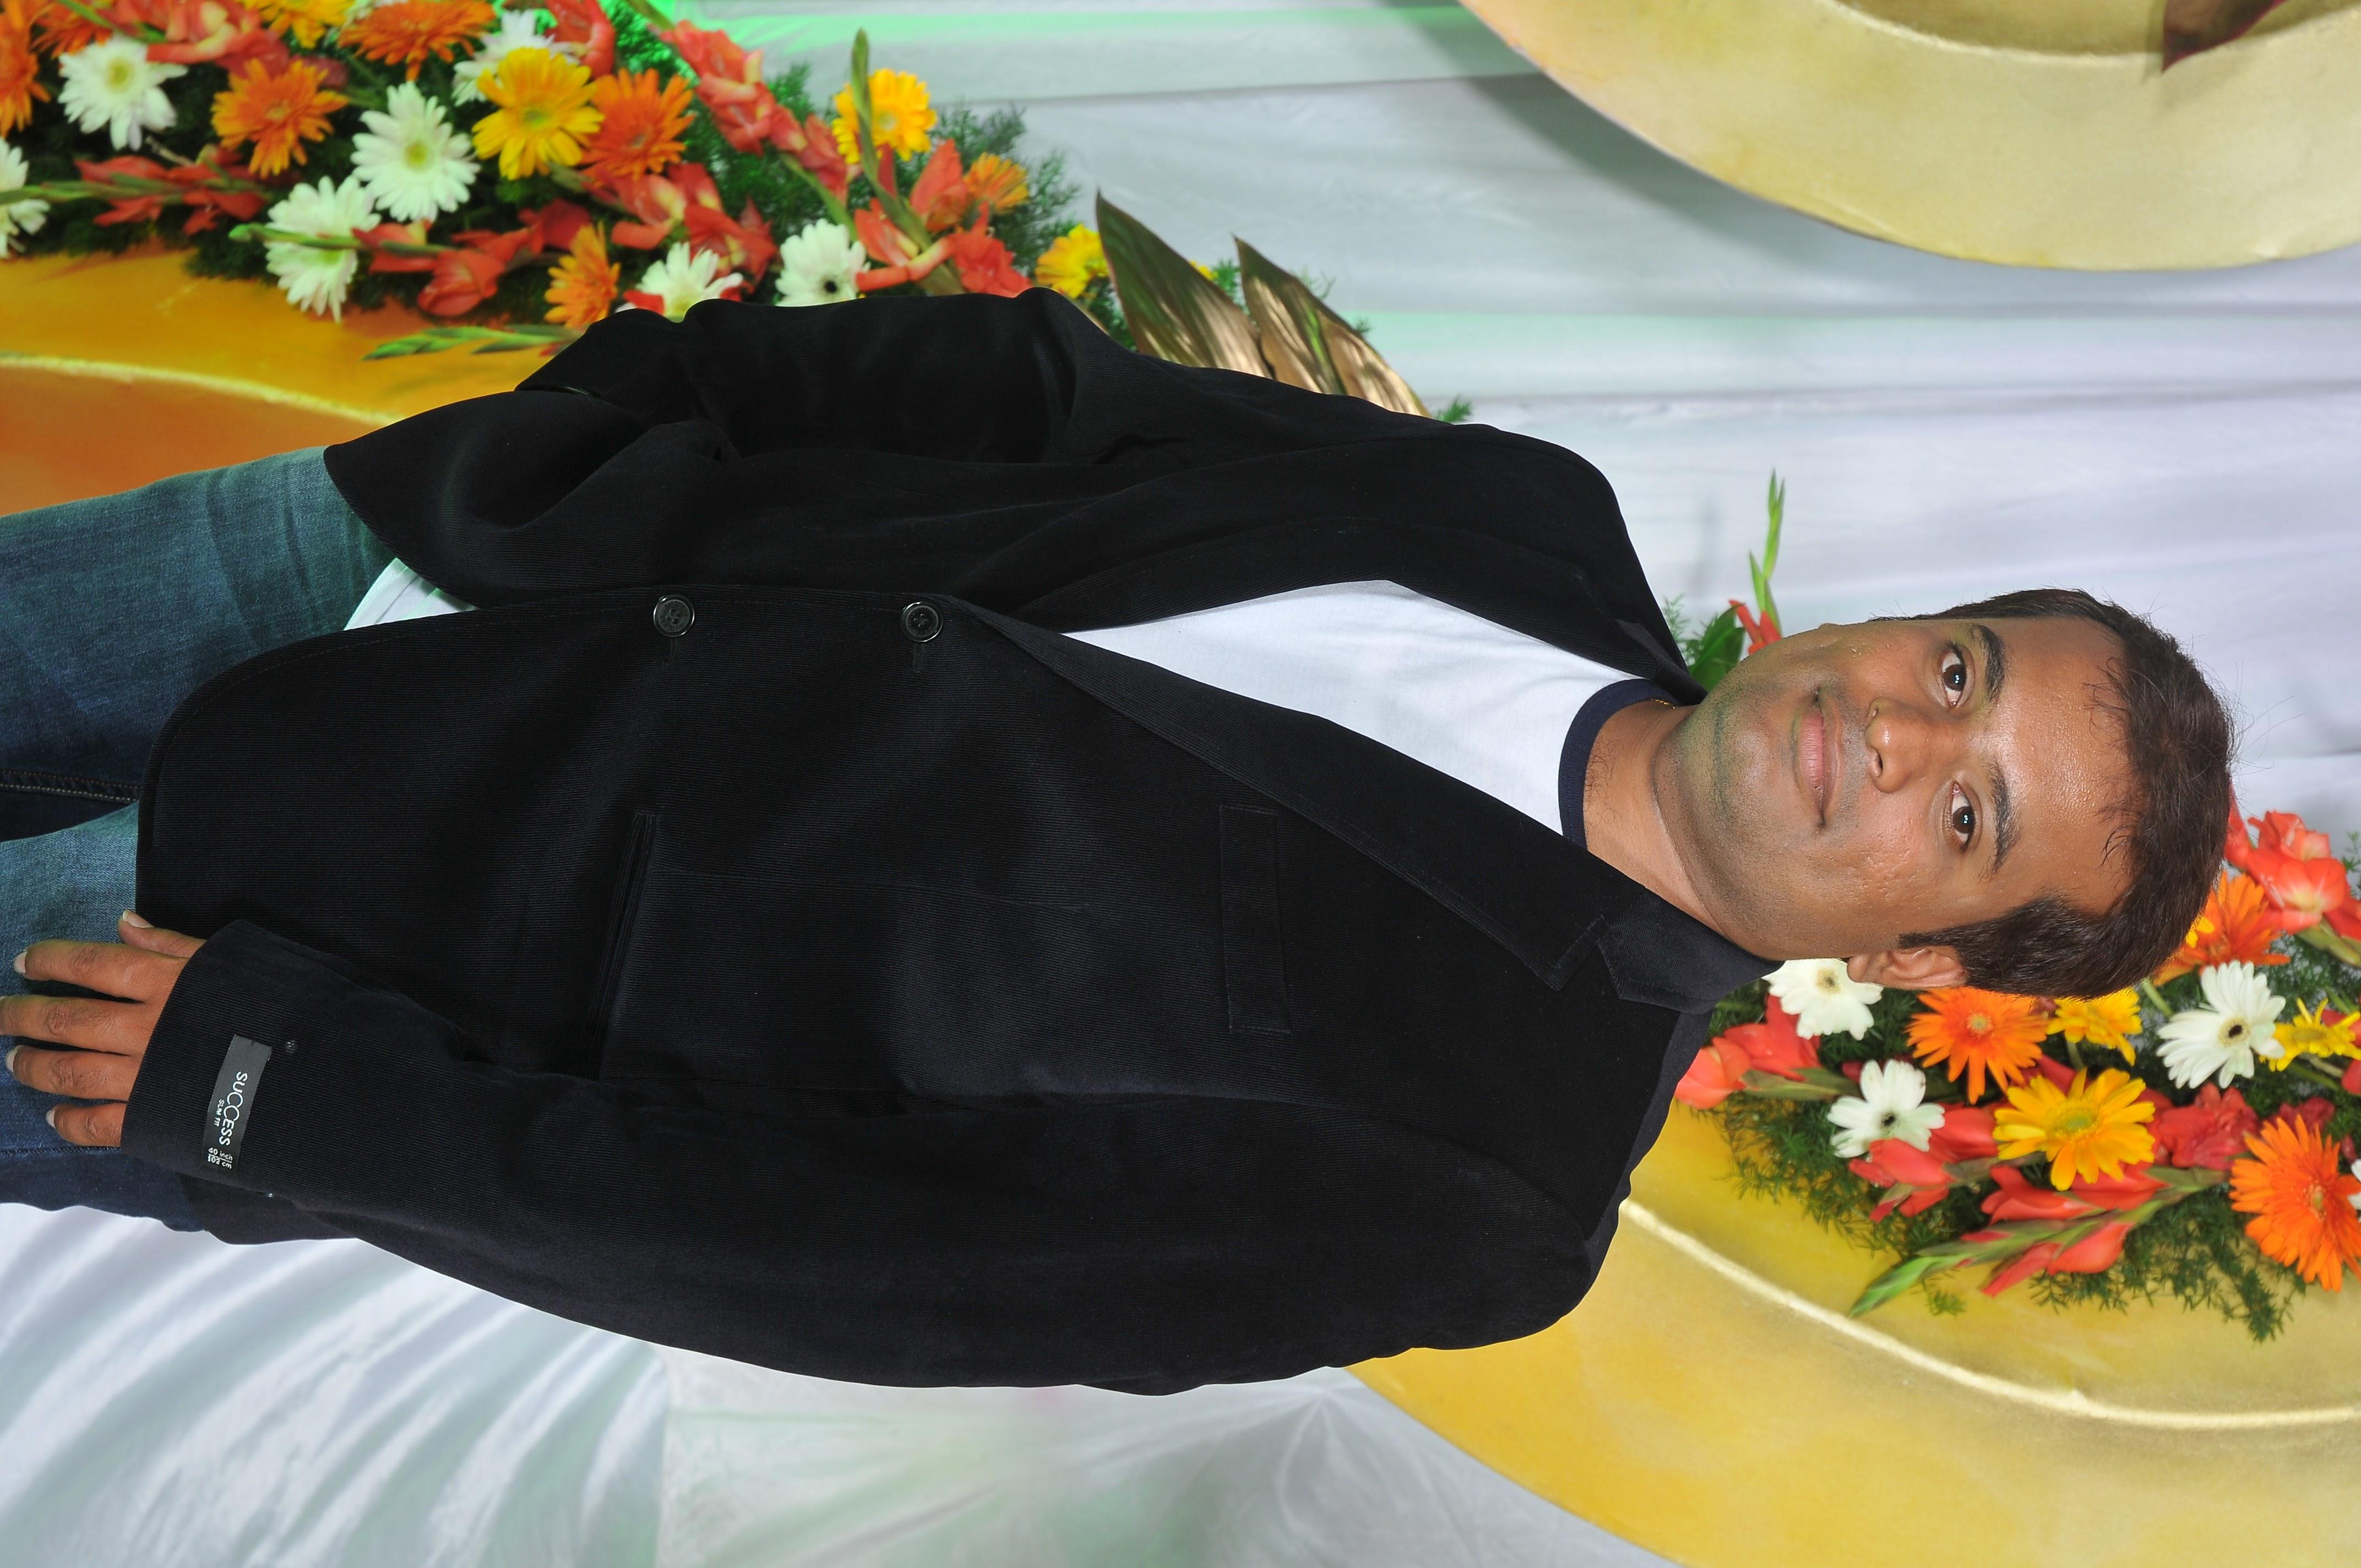 Aravindan Udayasekaran